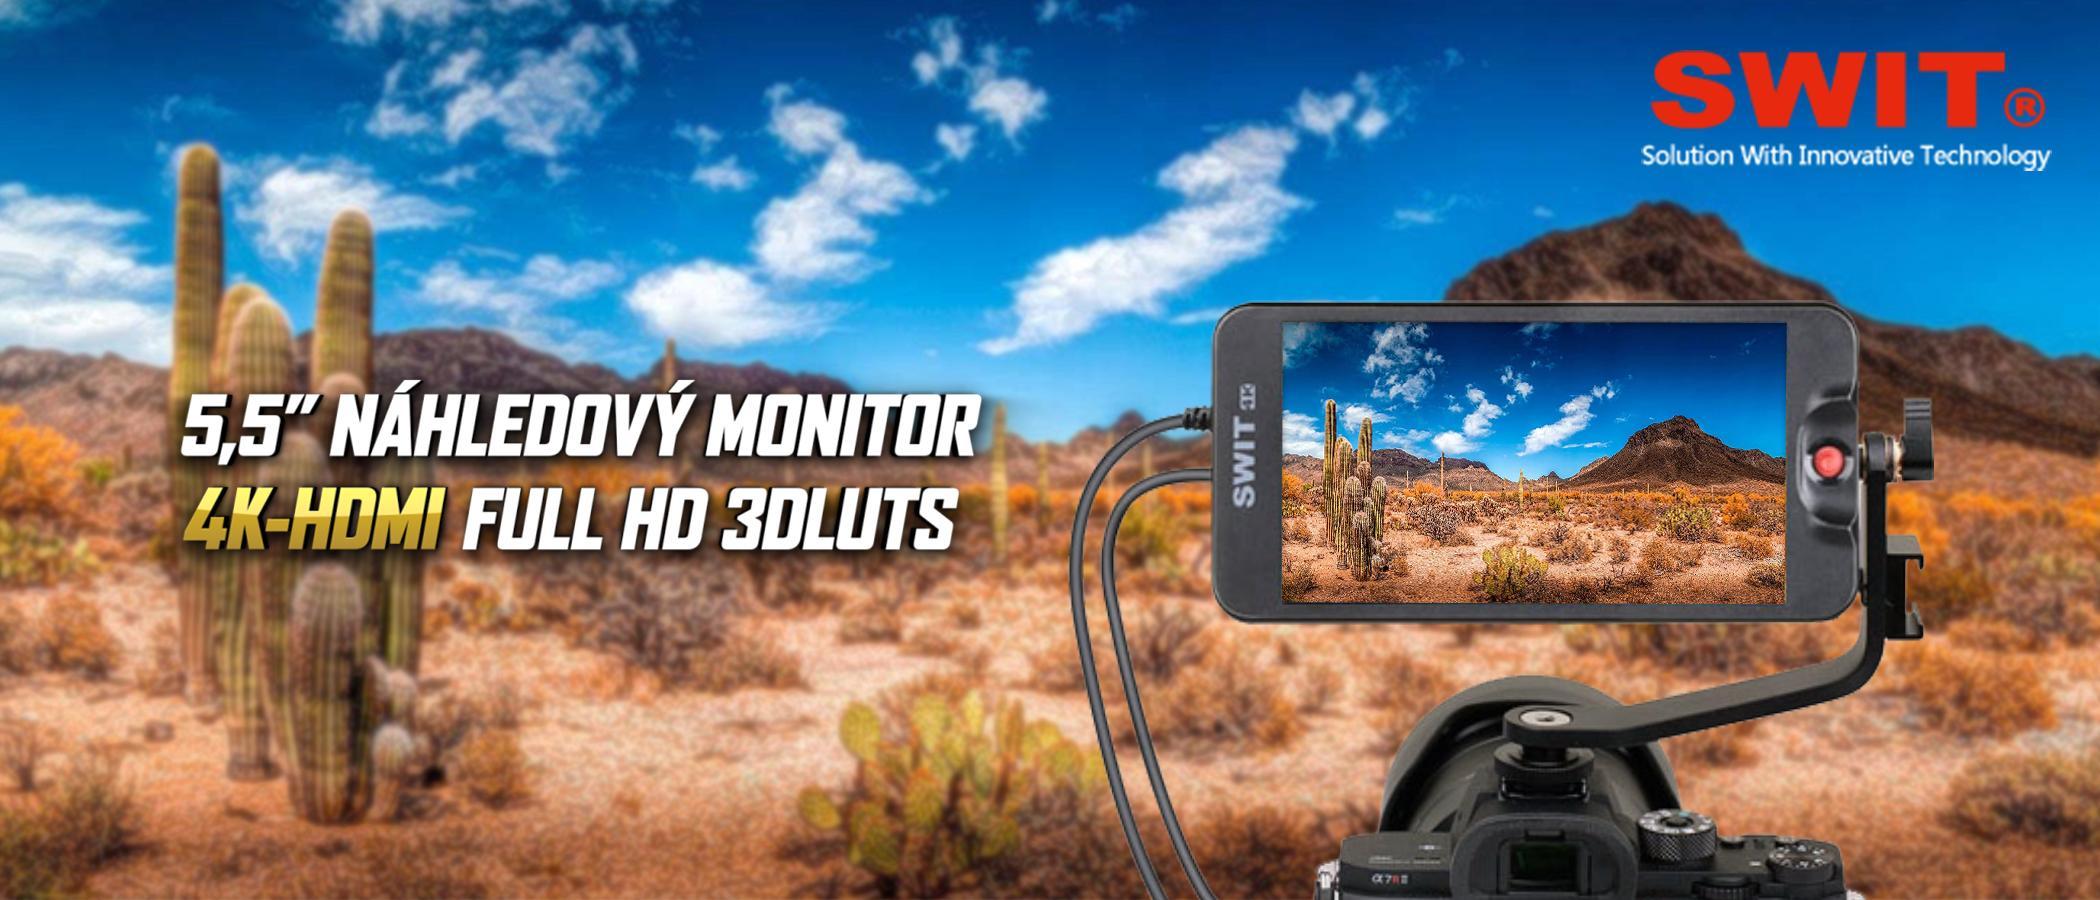 film-technika-5,5-náhledový-monitor-4k-hdmi-3dluts